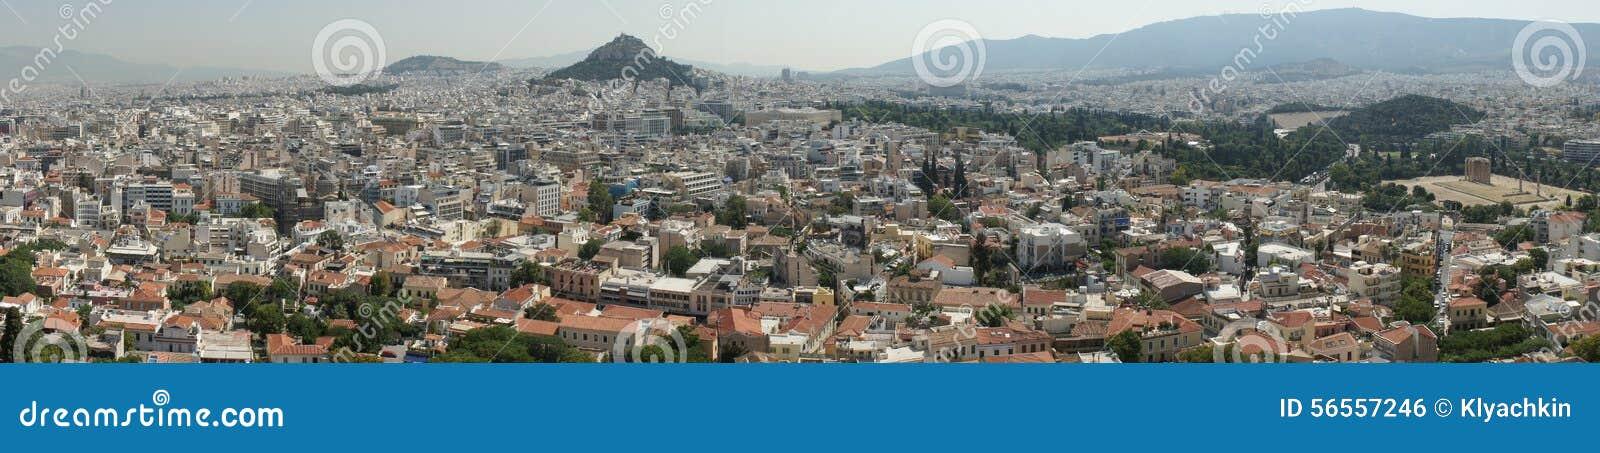 Download πανόραμα της Αθήνας εκδοτική εικόνες. εικόνα από βουνό - 56557246